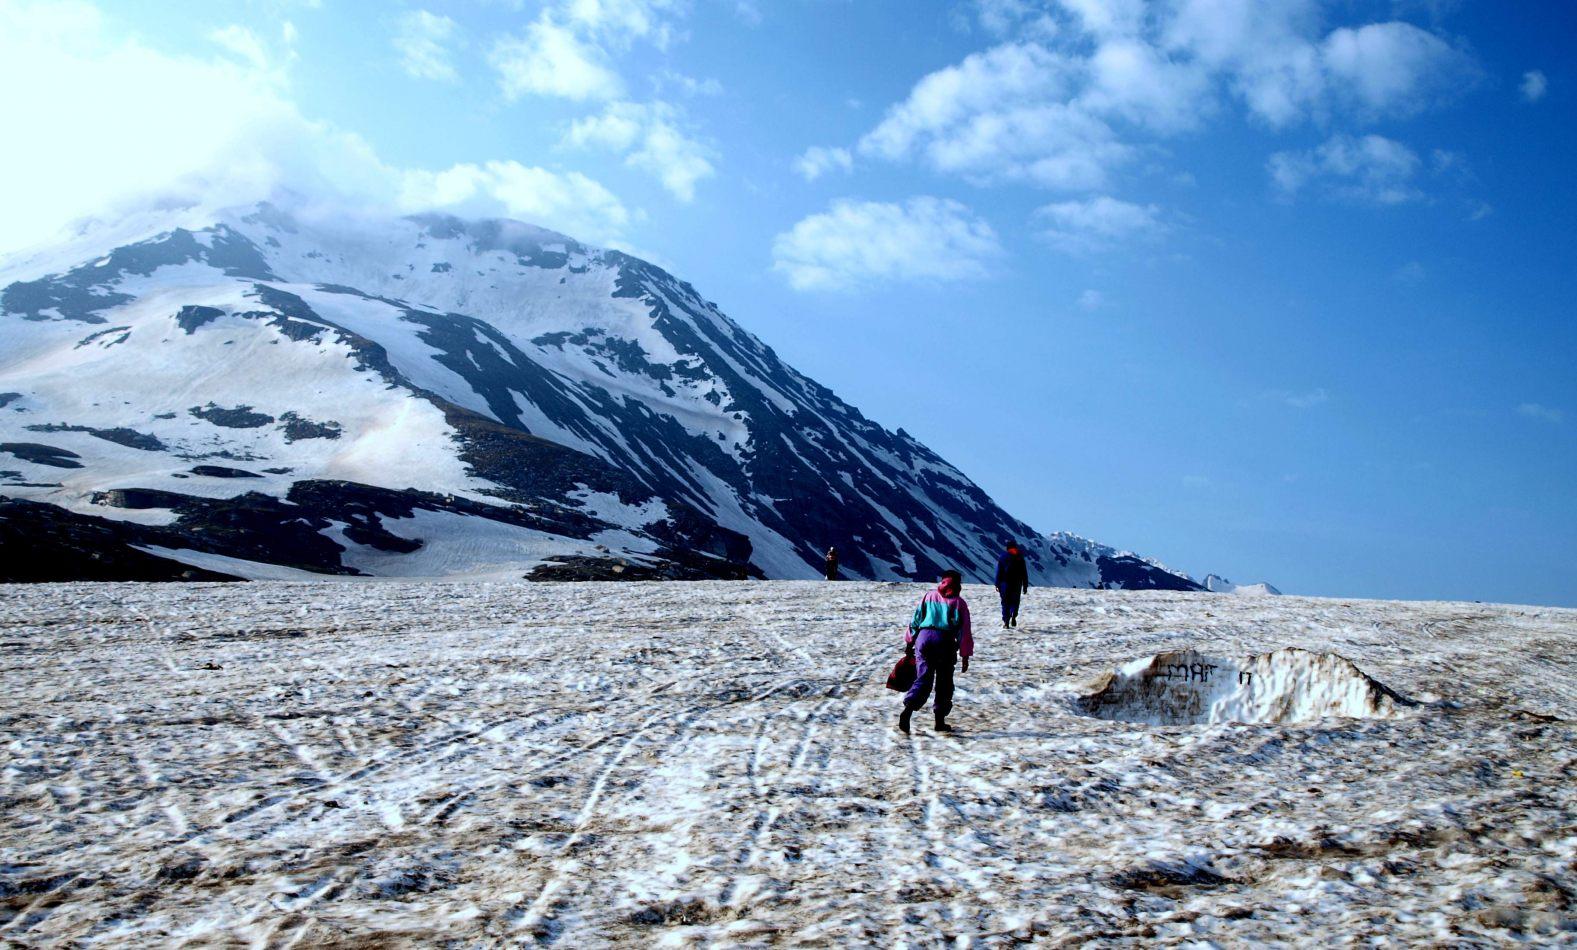 Hibiscus & Nomada : Rohtang Pass